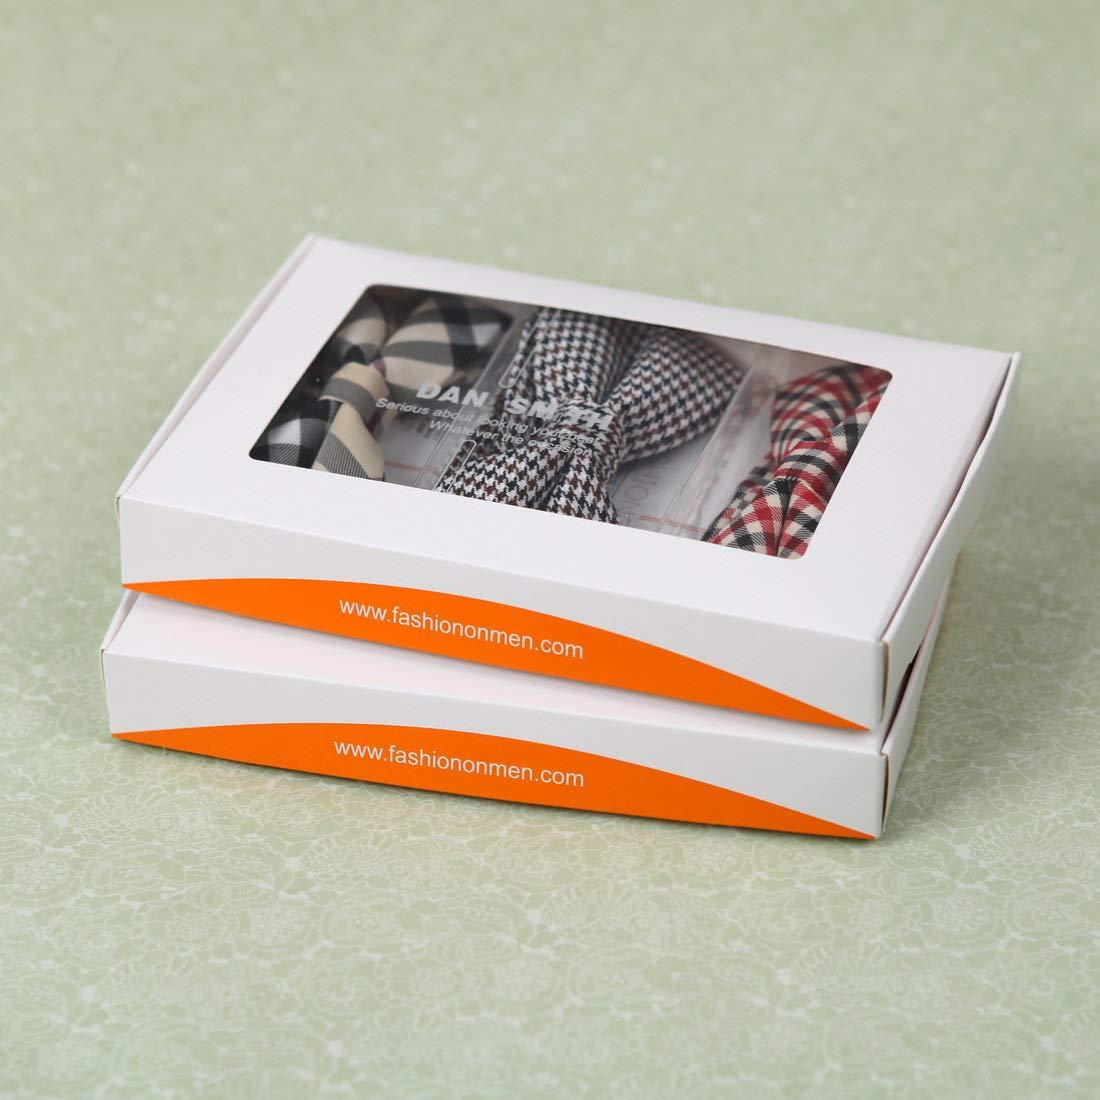 DBE0167 Groomsmen Pre-Tied Microfiber Bow ties Popular For Teen 3 Pack Bow Tie Set By Dan Smith